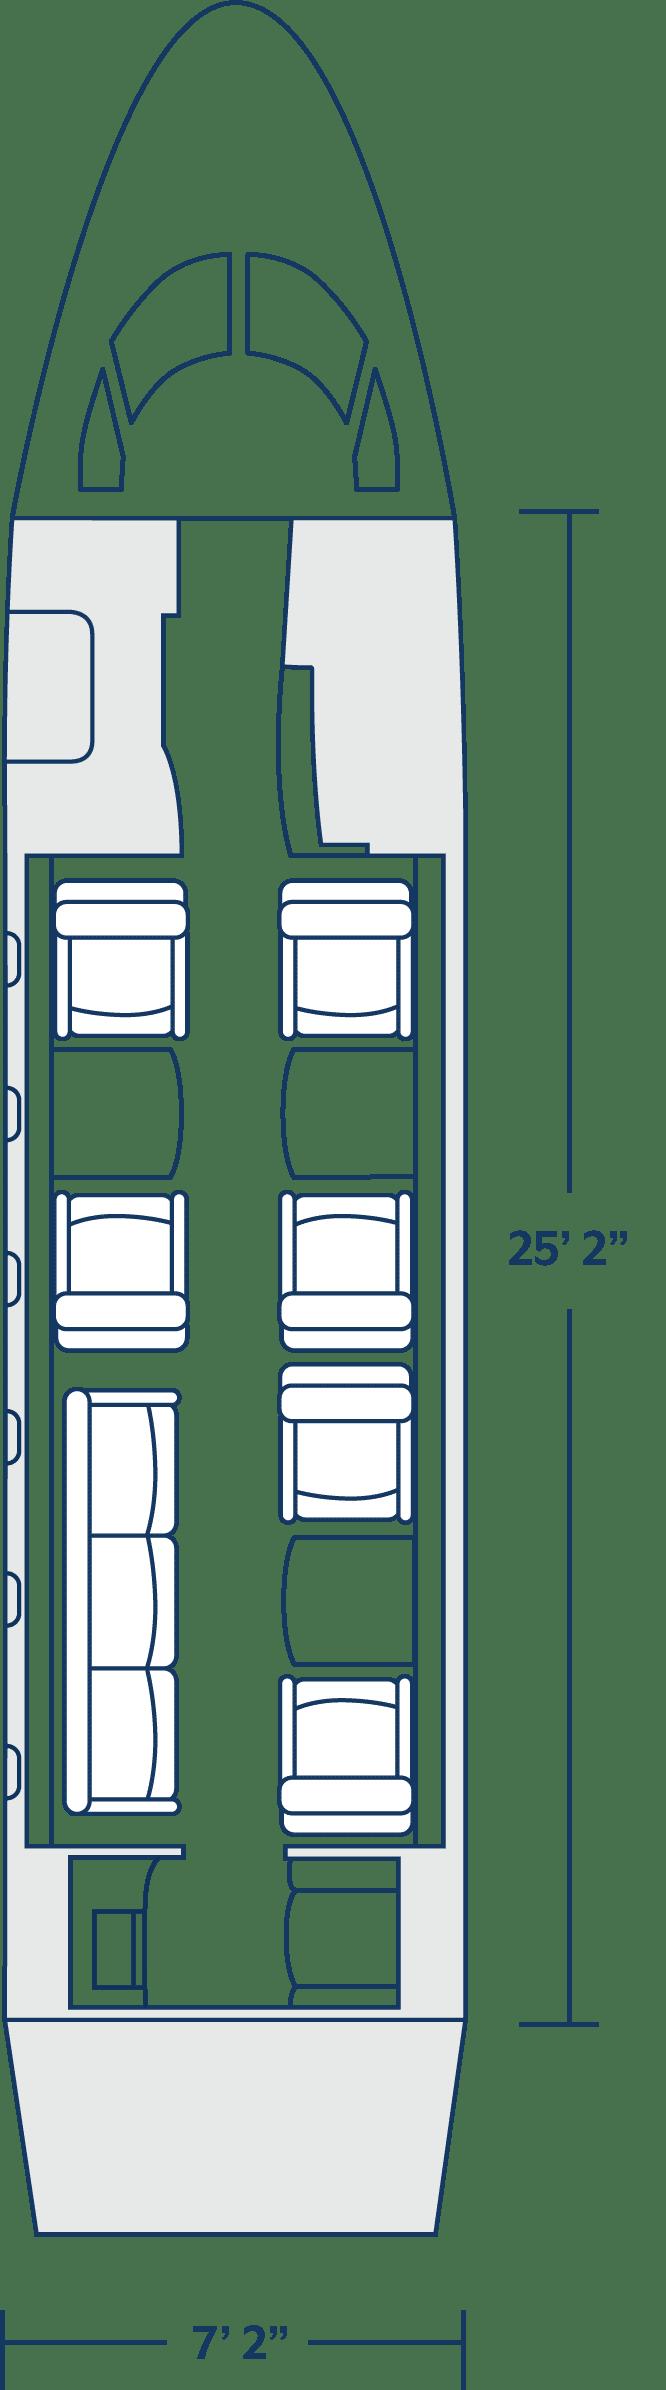 Challenger 350 Cabin Configuration